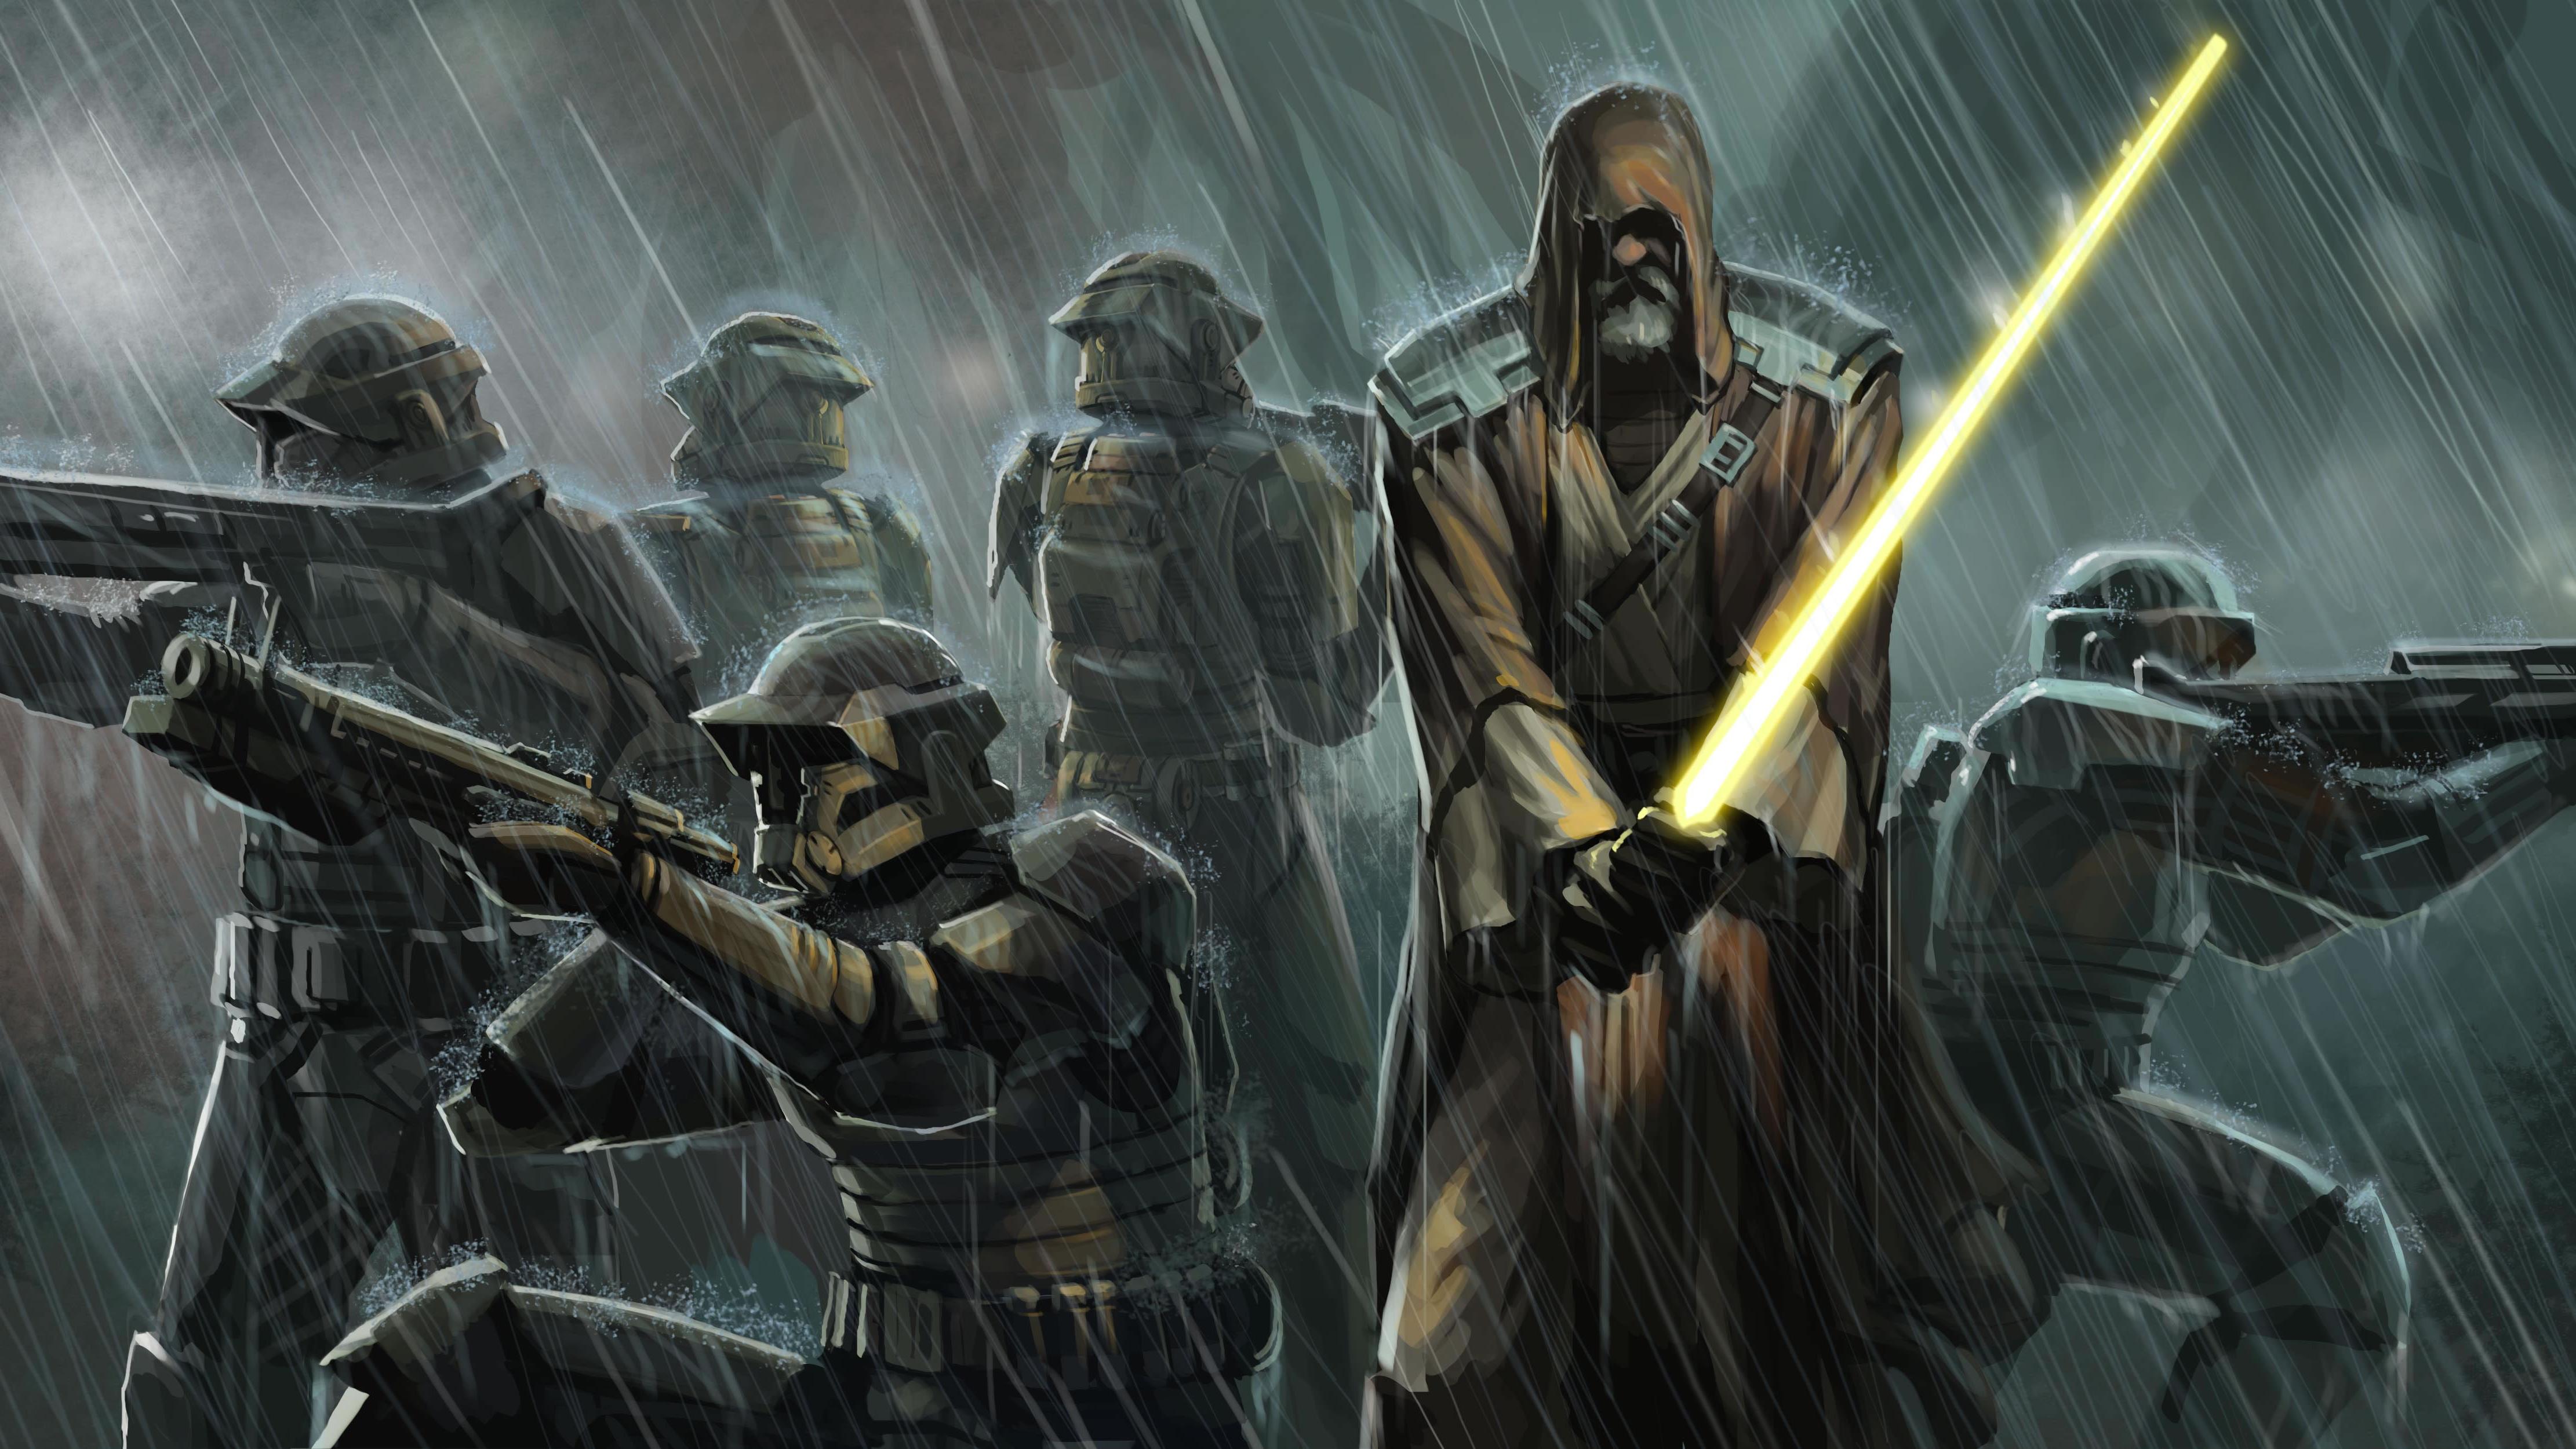 Star Wars Clone Trooper Wallpaper Posted By Michelle Walker